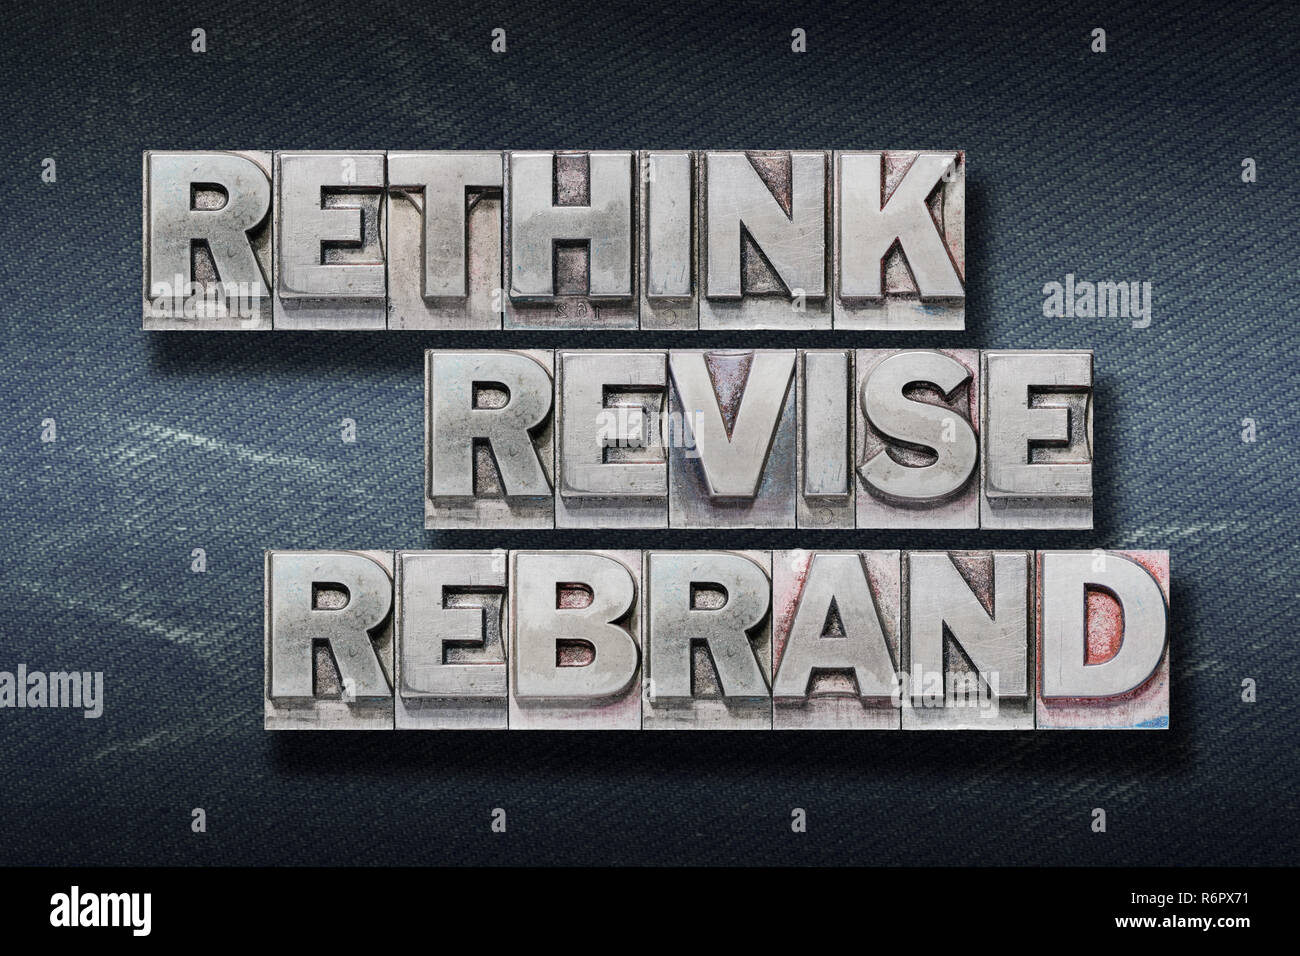 rethink revise rebrand words made from metallic letterpress on dark jeans background - Stock Image